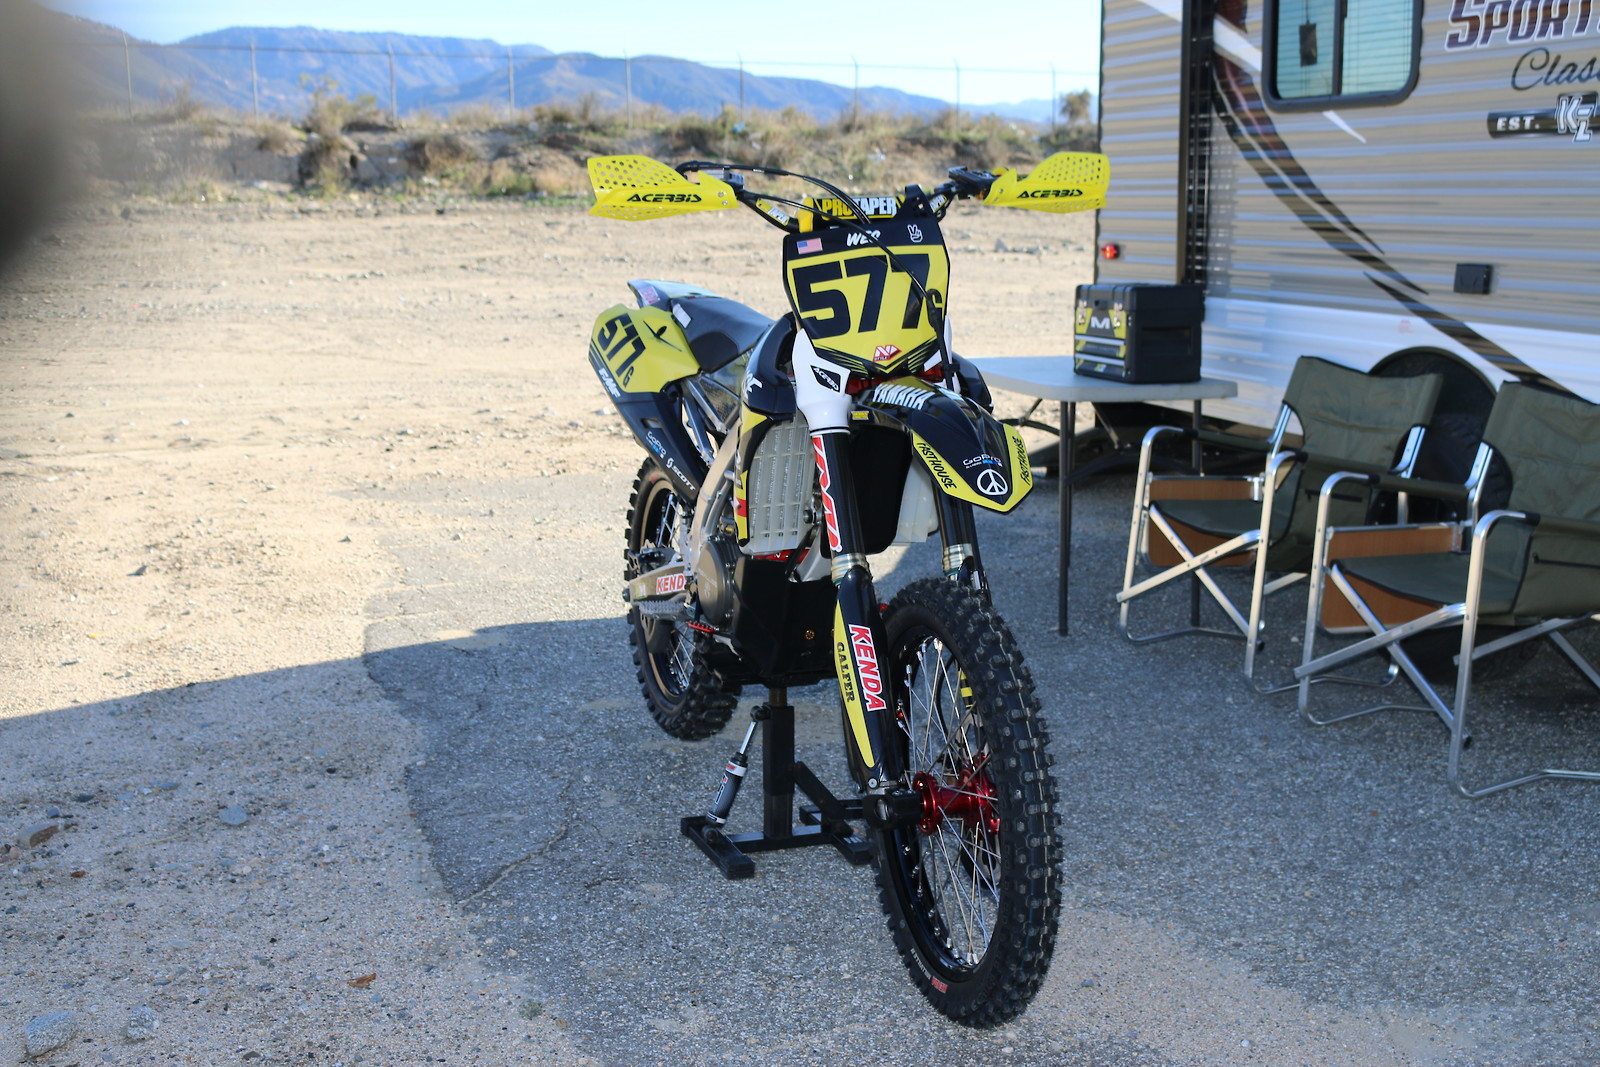 IMG 5900 - WLD - Motocross Pictures - Vital MX